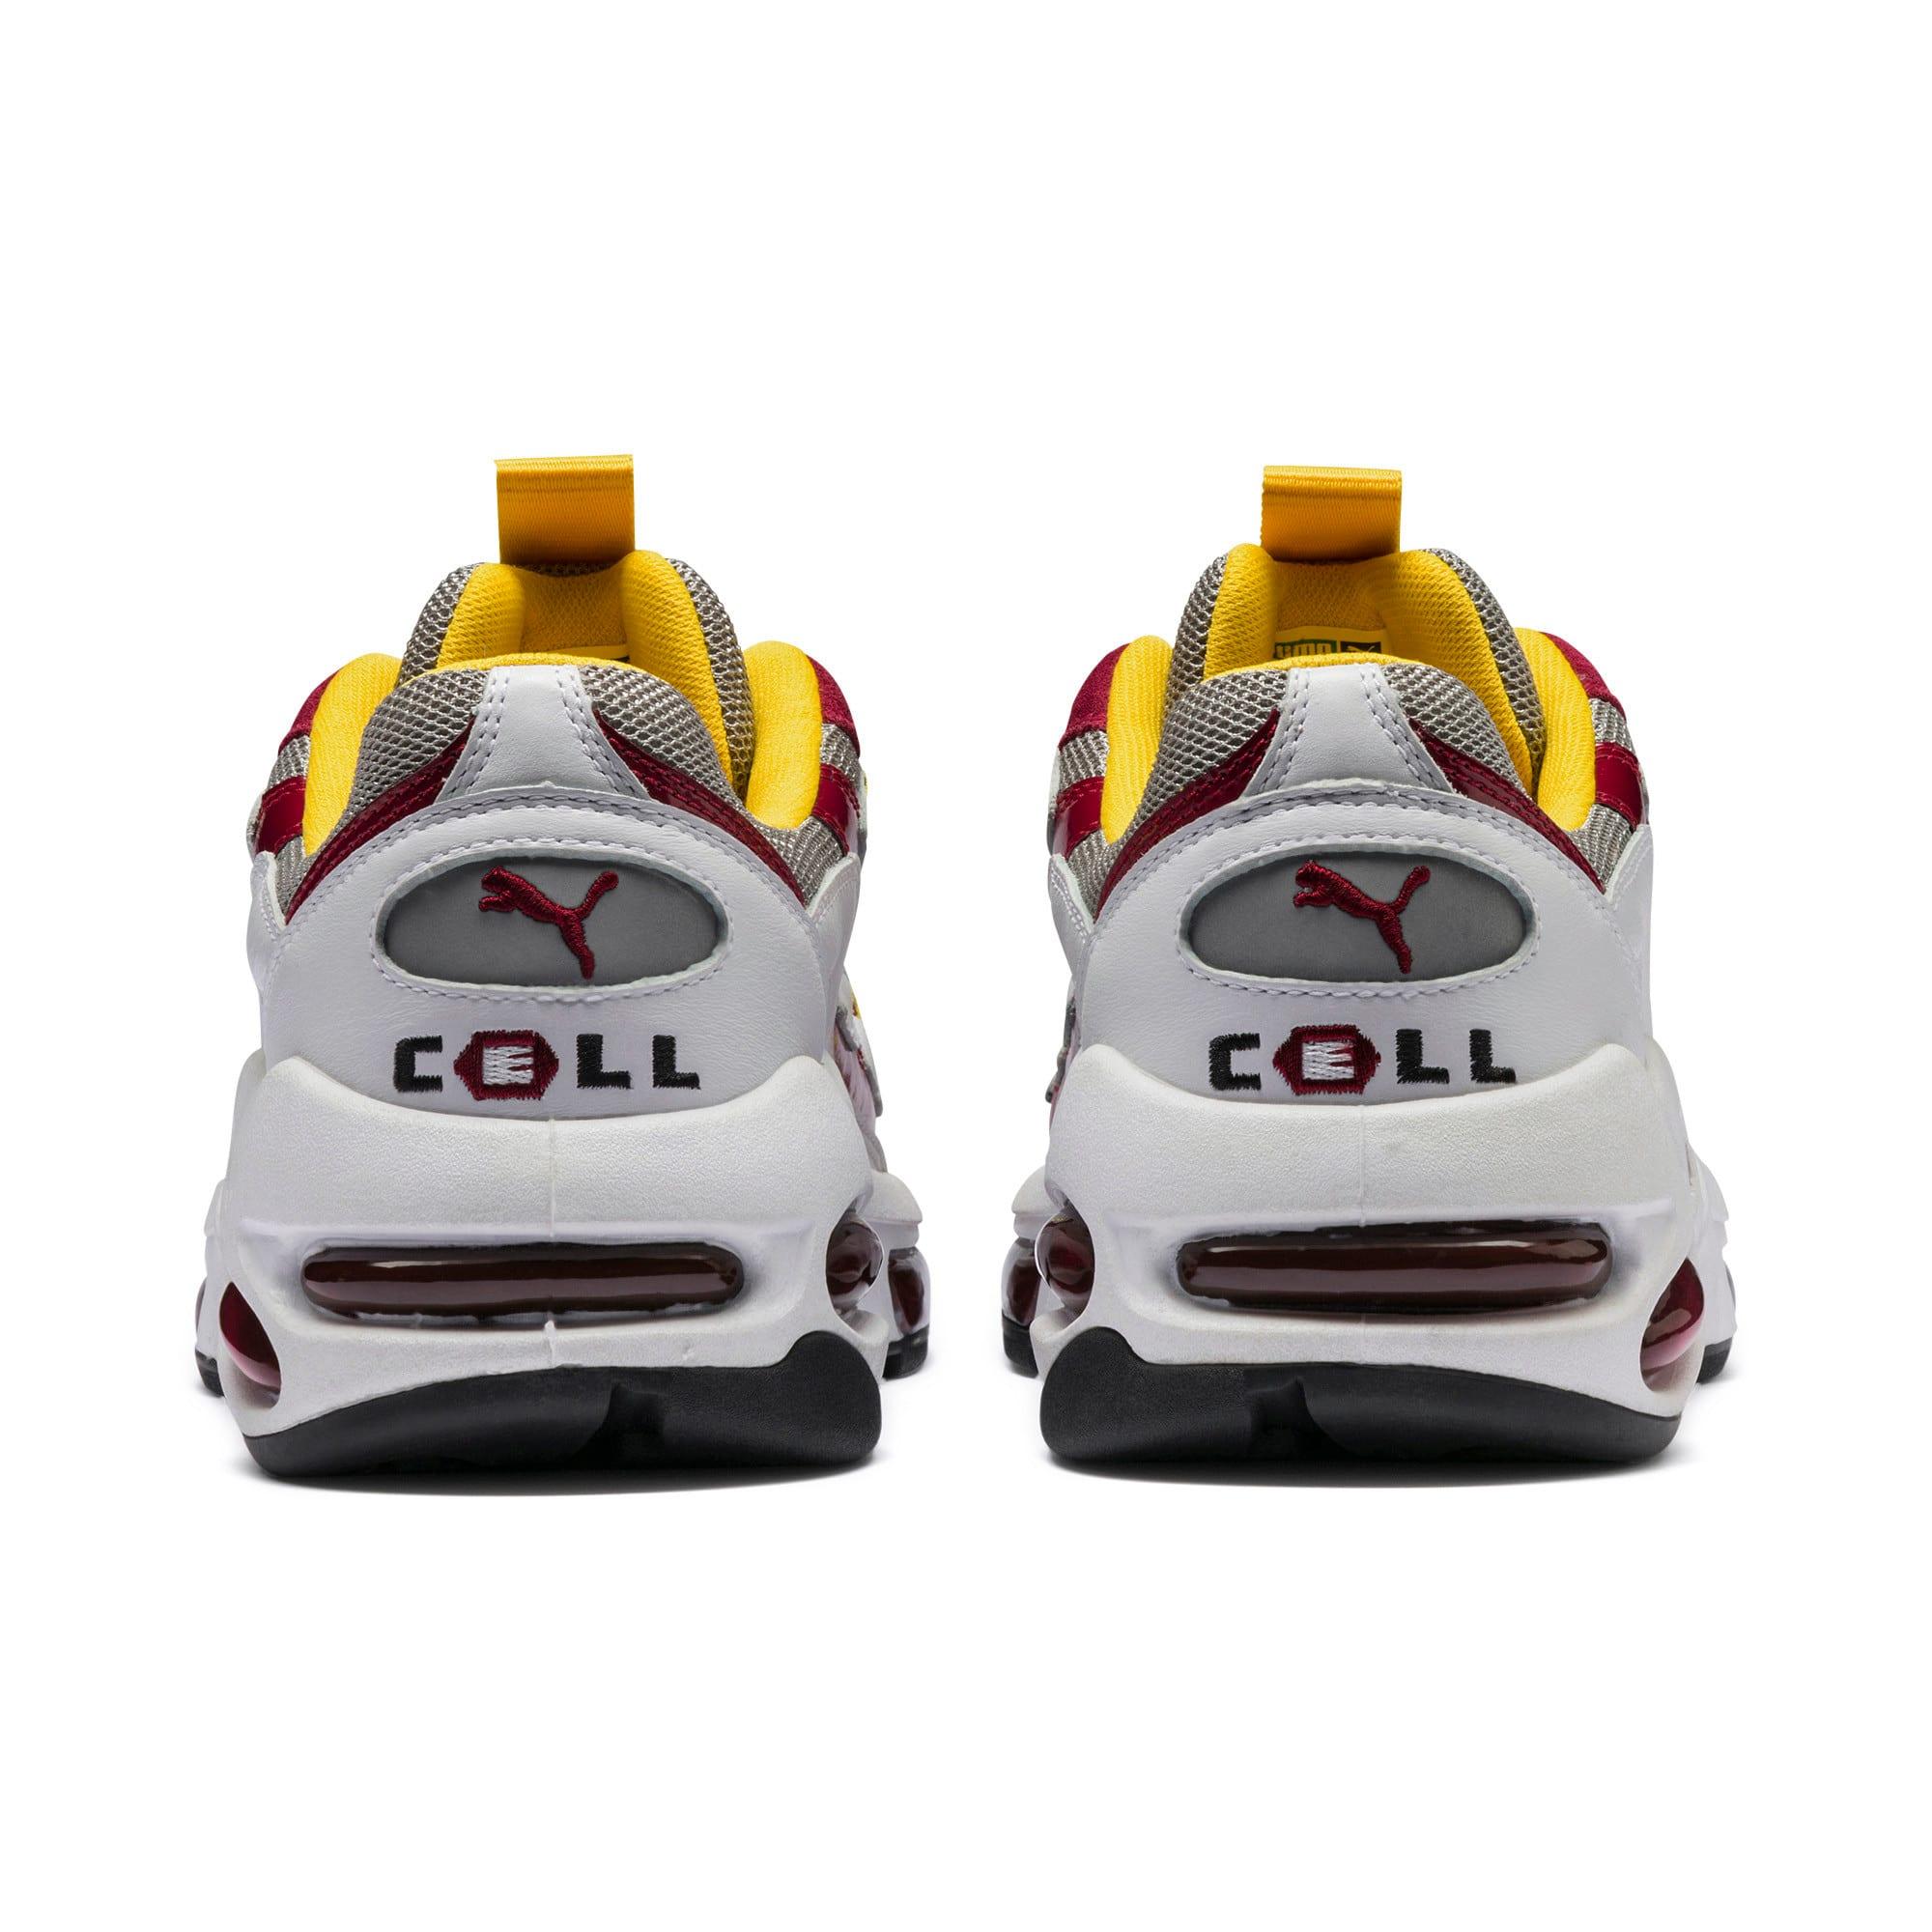 Thumbnail 4 of CELL Endura Patent 98 Men's Sneakers, Limestone-Cordovan, medium